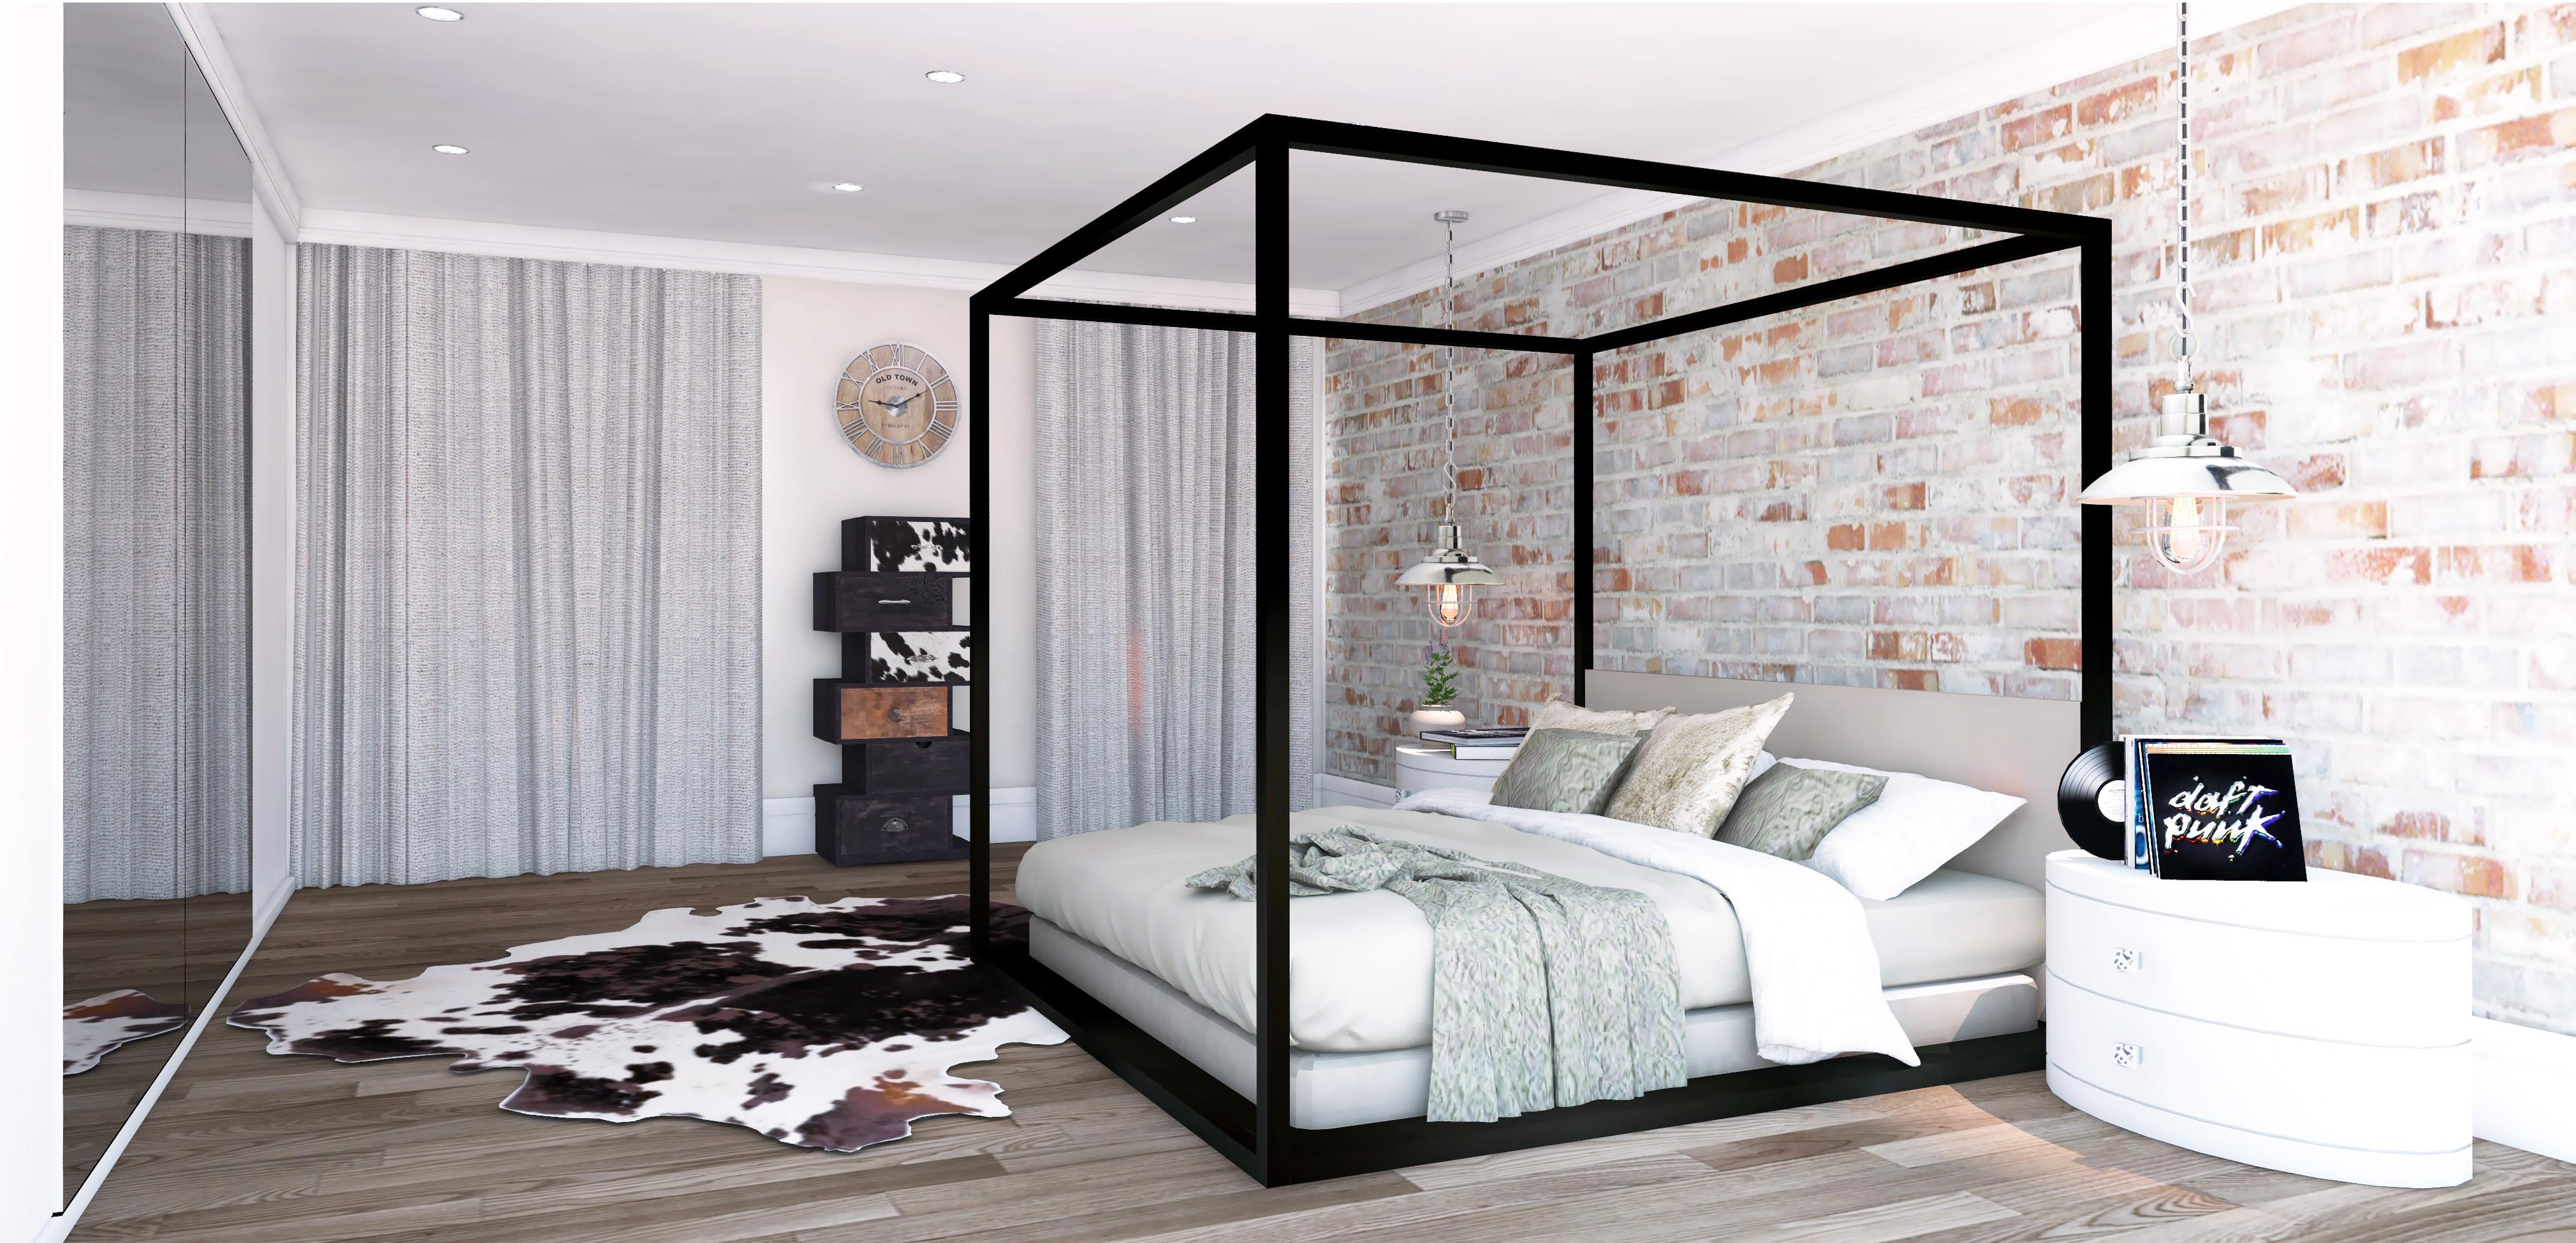 Brixton_bedroom_2